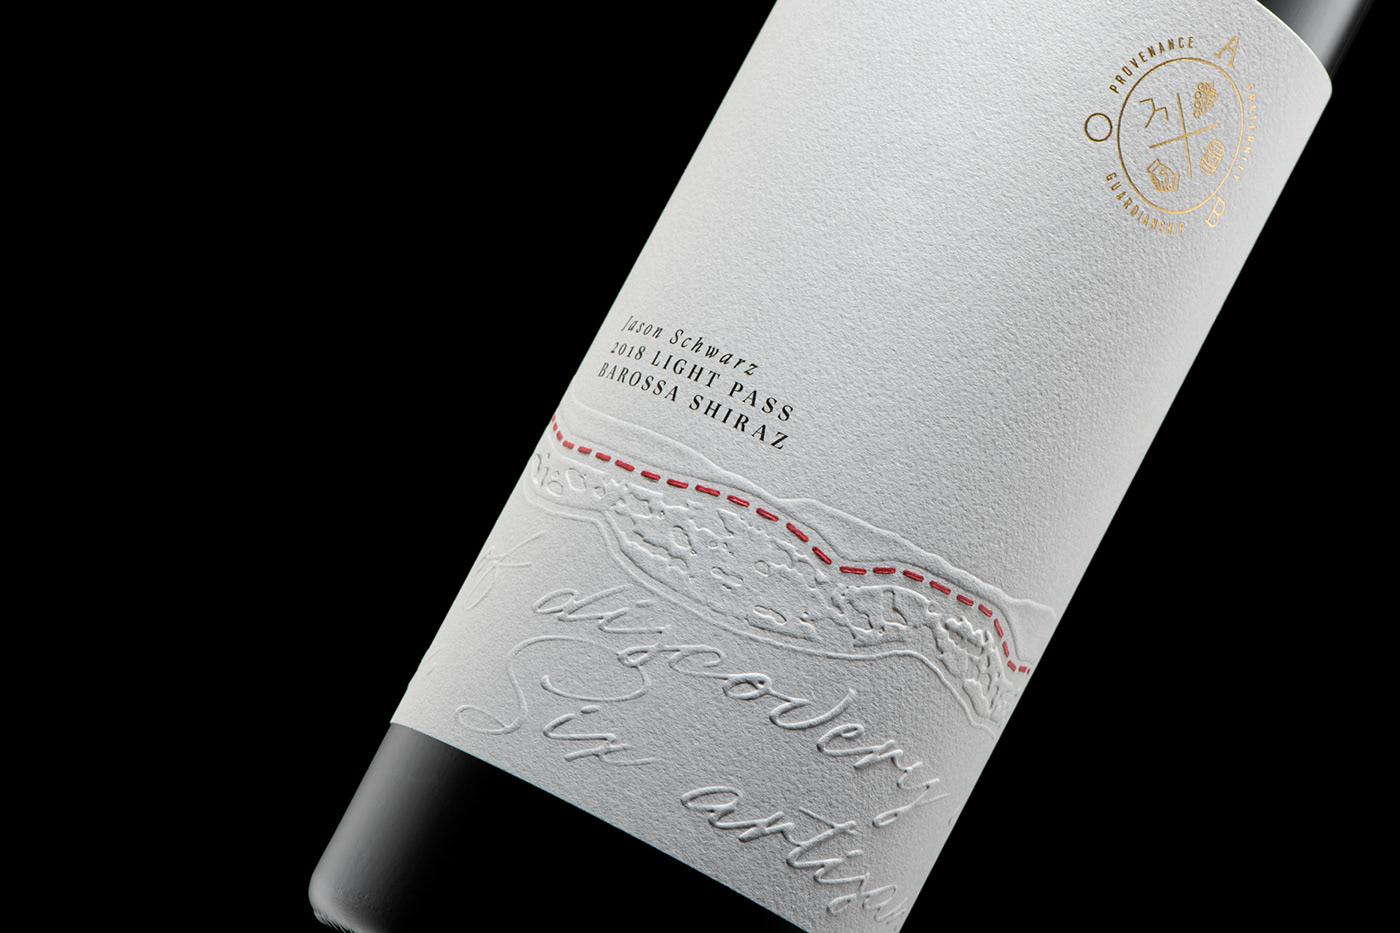 wine Packaging branding  graphic design  barossa South Australia emboss foil wine label Wine Packaging